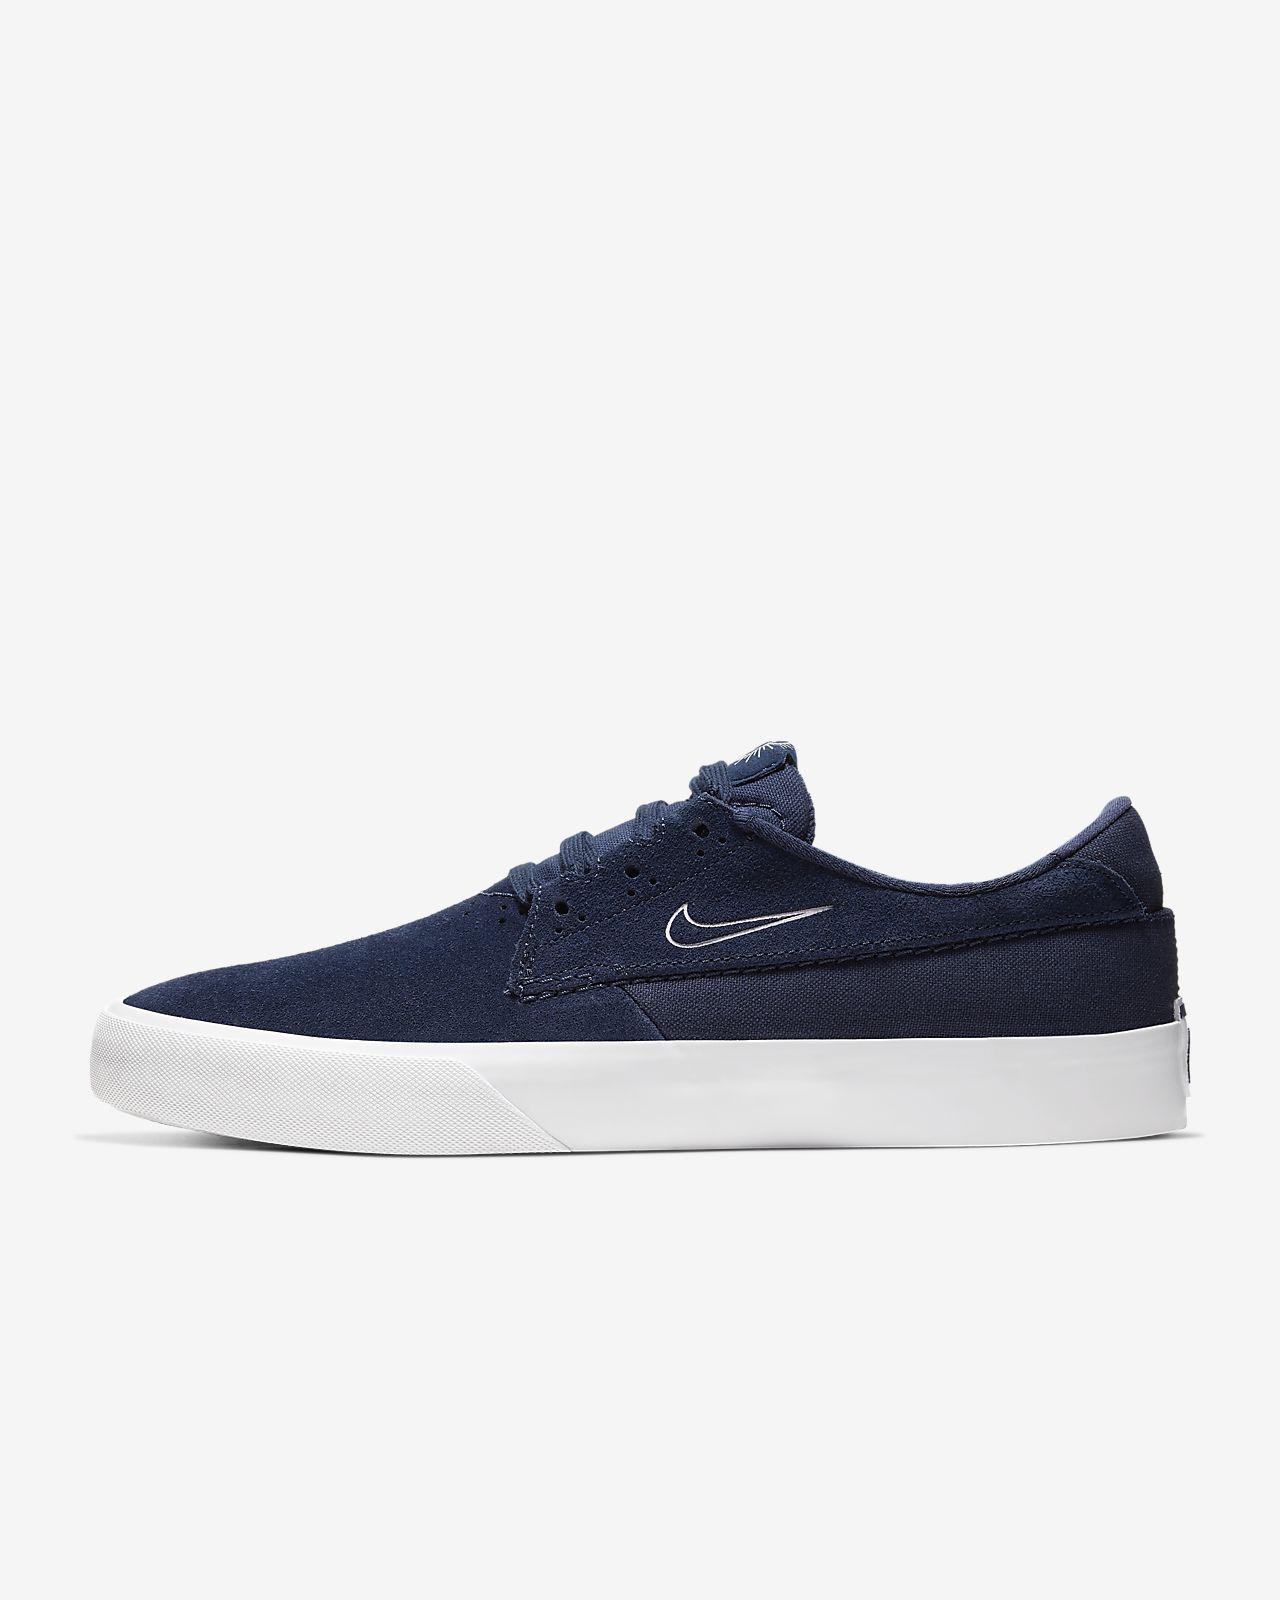 Chaussure de skateboard Nike SB Shane